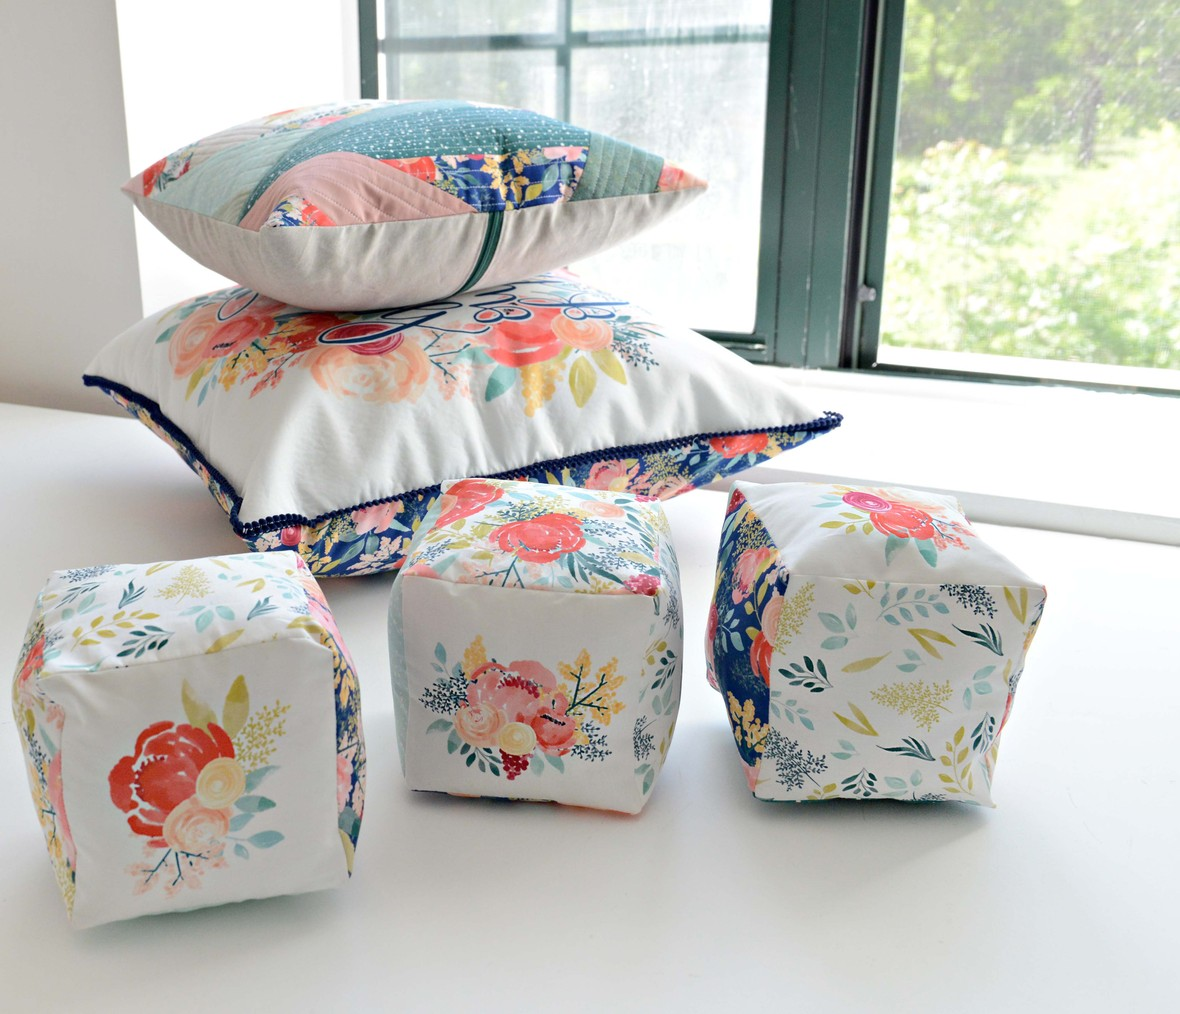 Sunshine Blossoms Pillows and Soft Fabric Blocks Mariah Danielle Design at Hawthorne Supply Co